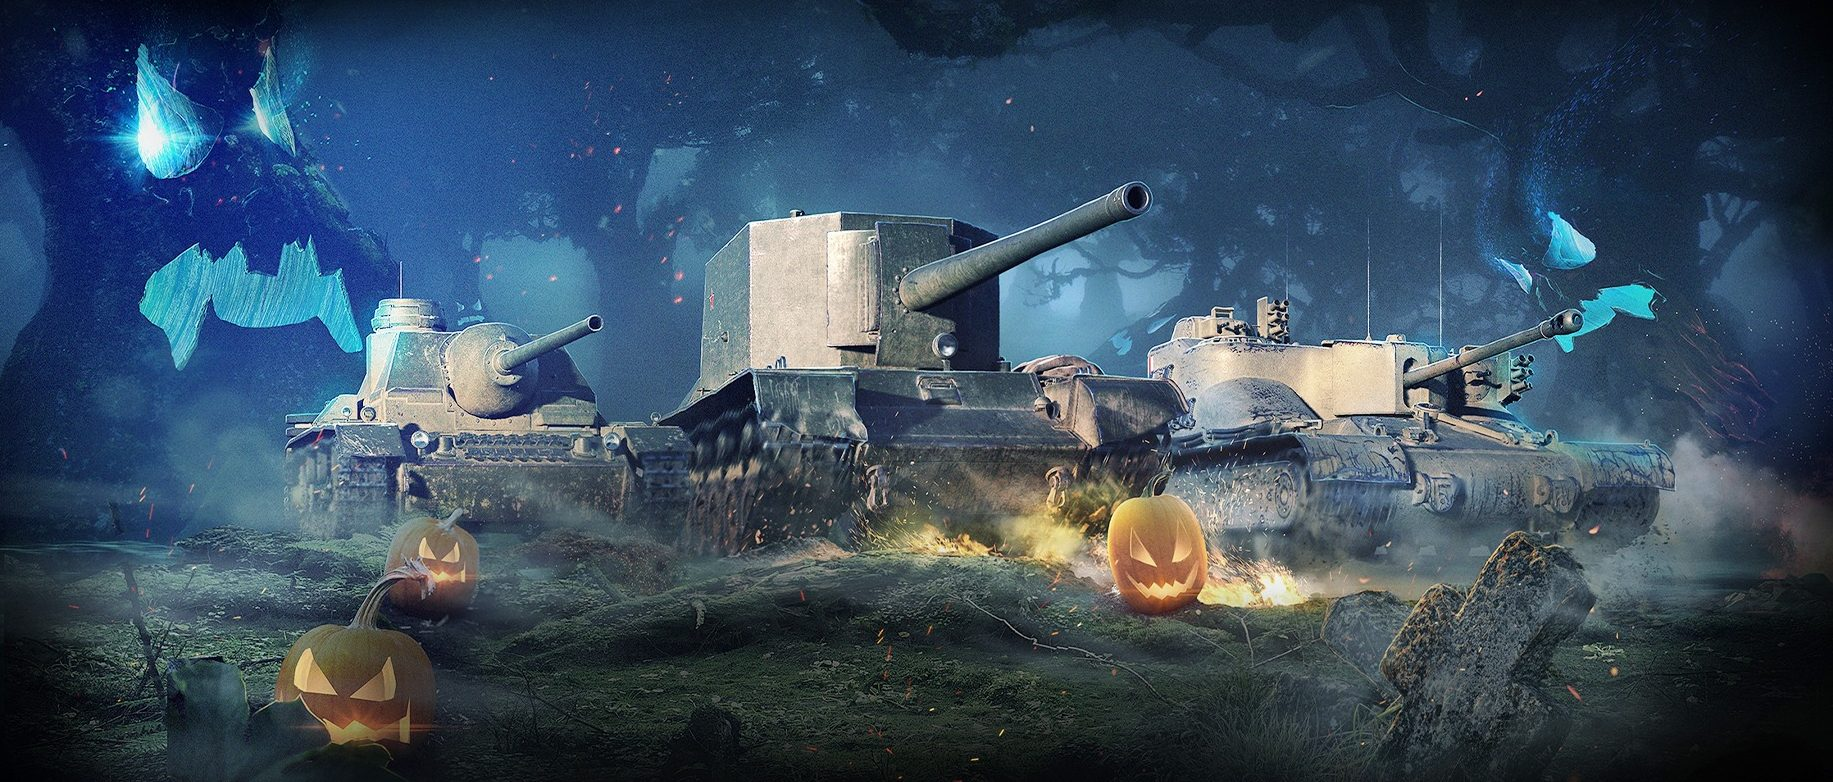 Wot Halloween Reward 2020 World of Tanks EU   Halloween Tank Rewards   missions and prizes